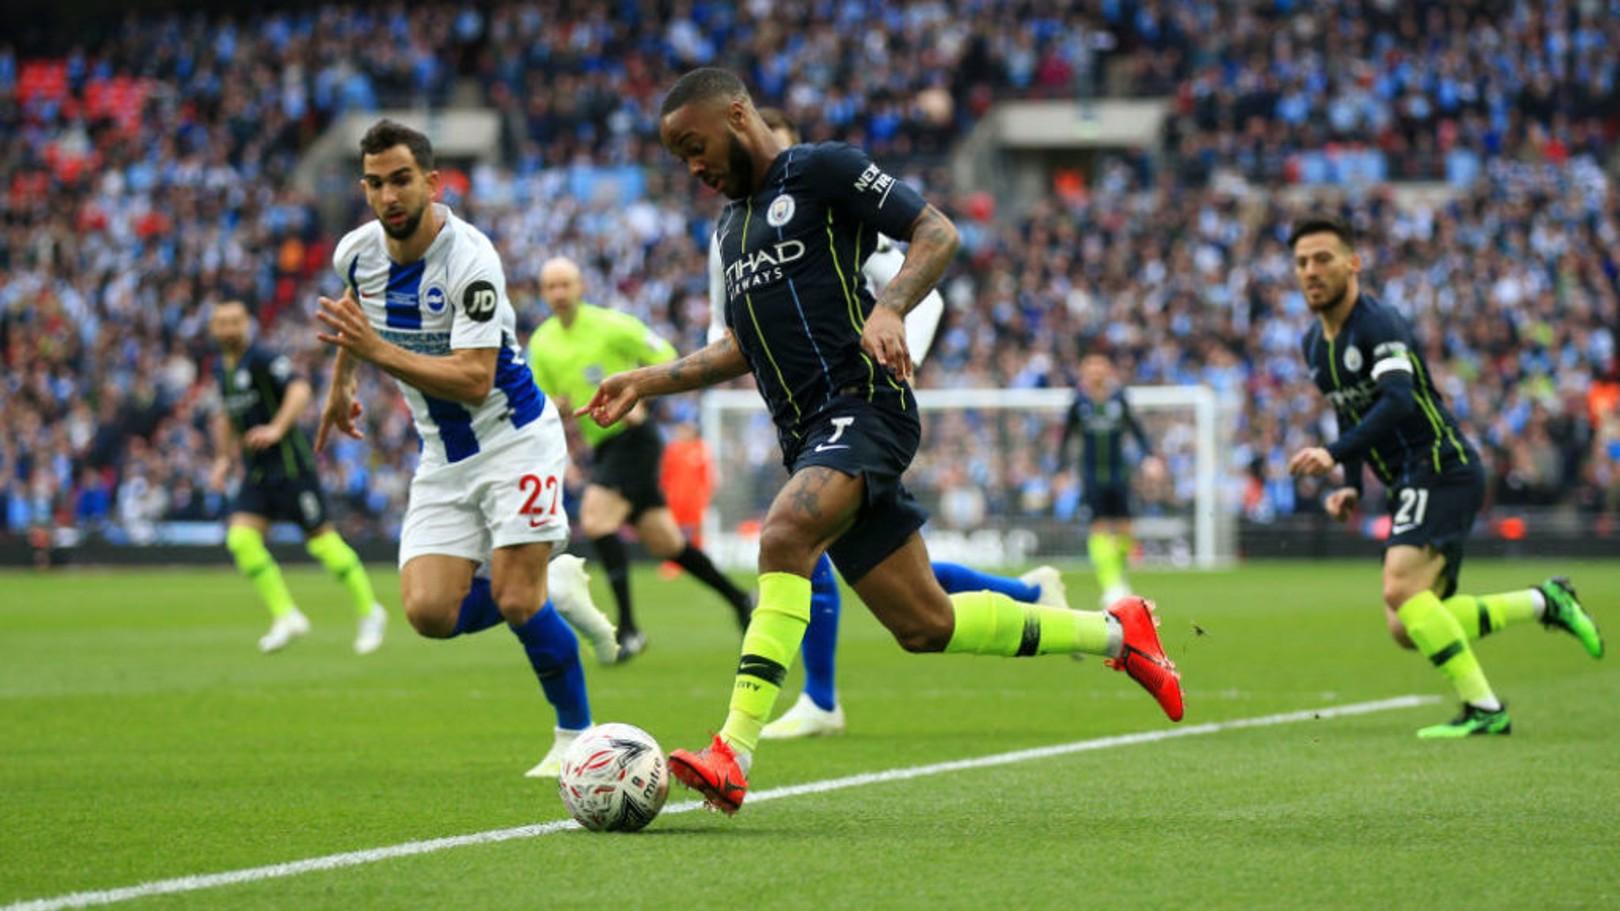 RAZZLE DAZZLE: Raheem Sterling takes on the Brighton defence